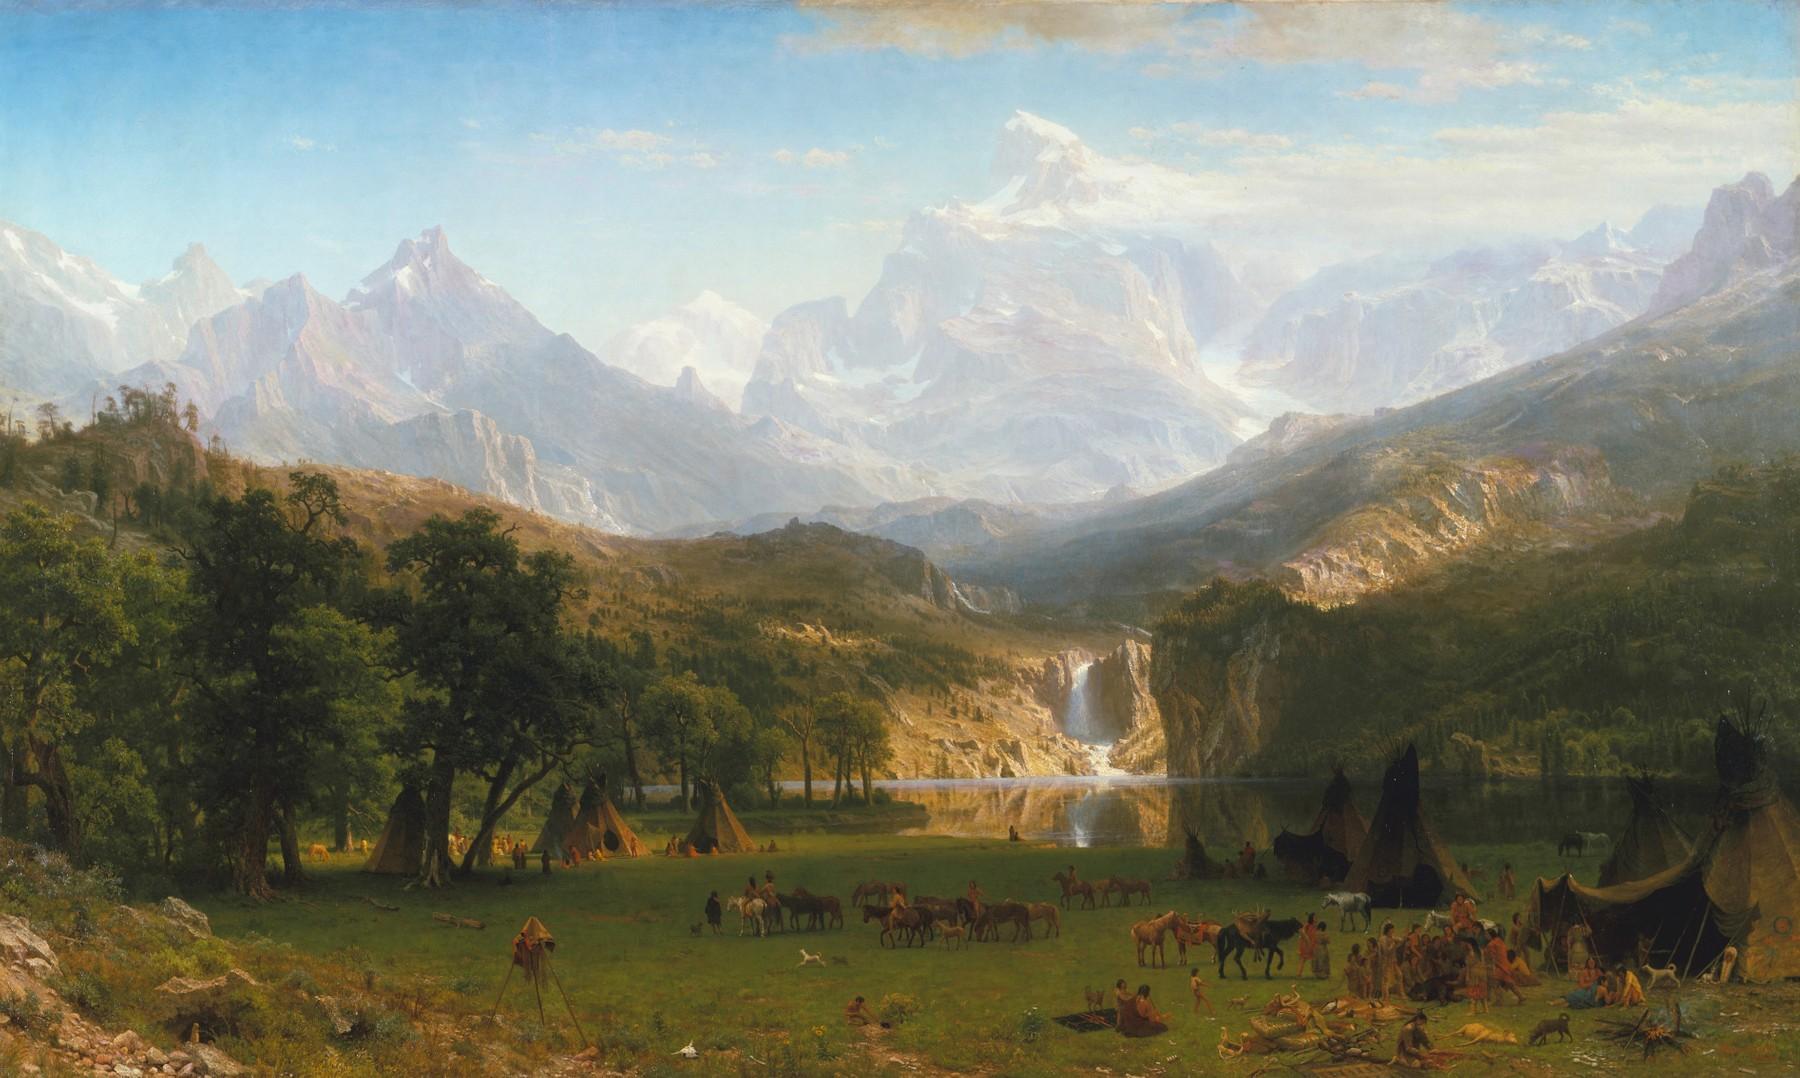 albert_bierstadt_-_the_rocky_mountains-_lander-s_peak.jpg